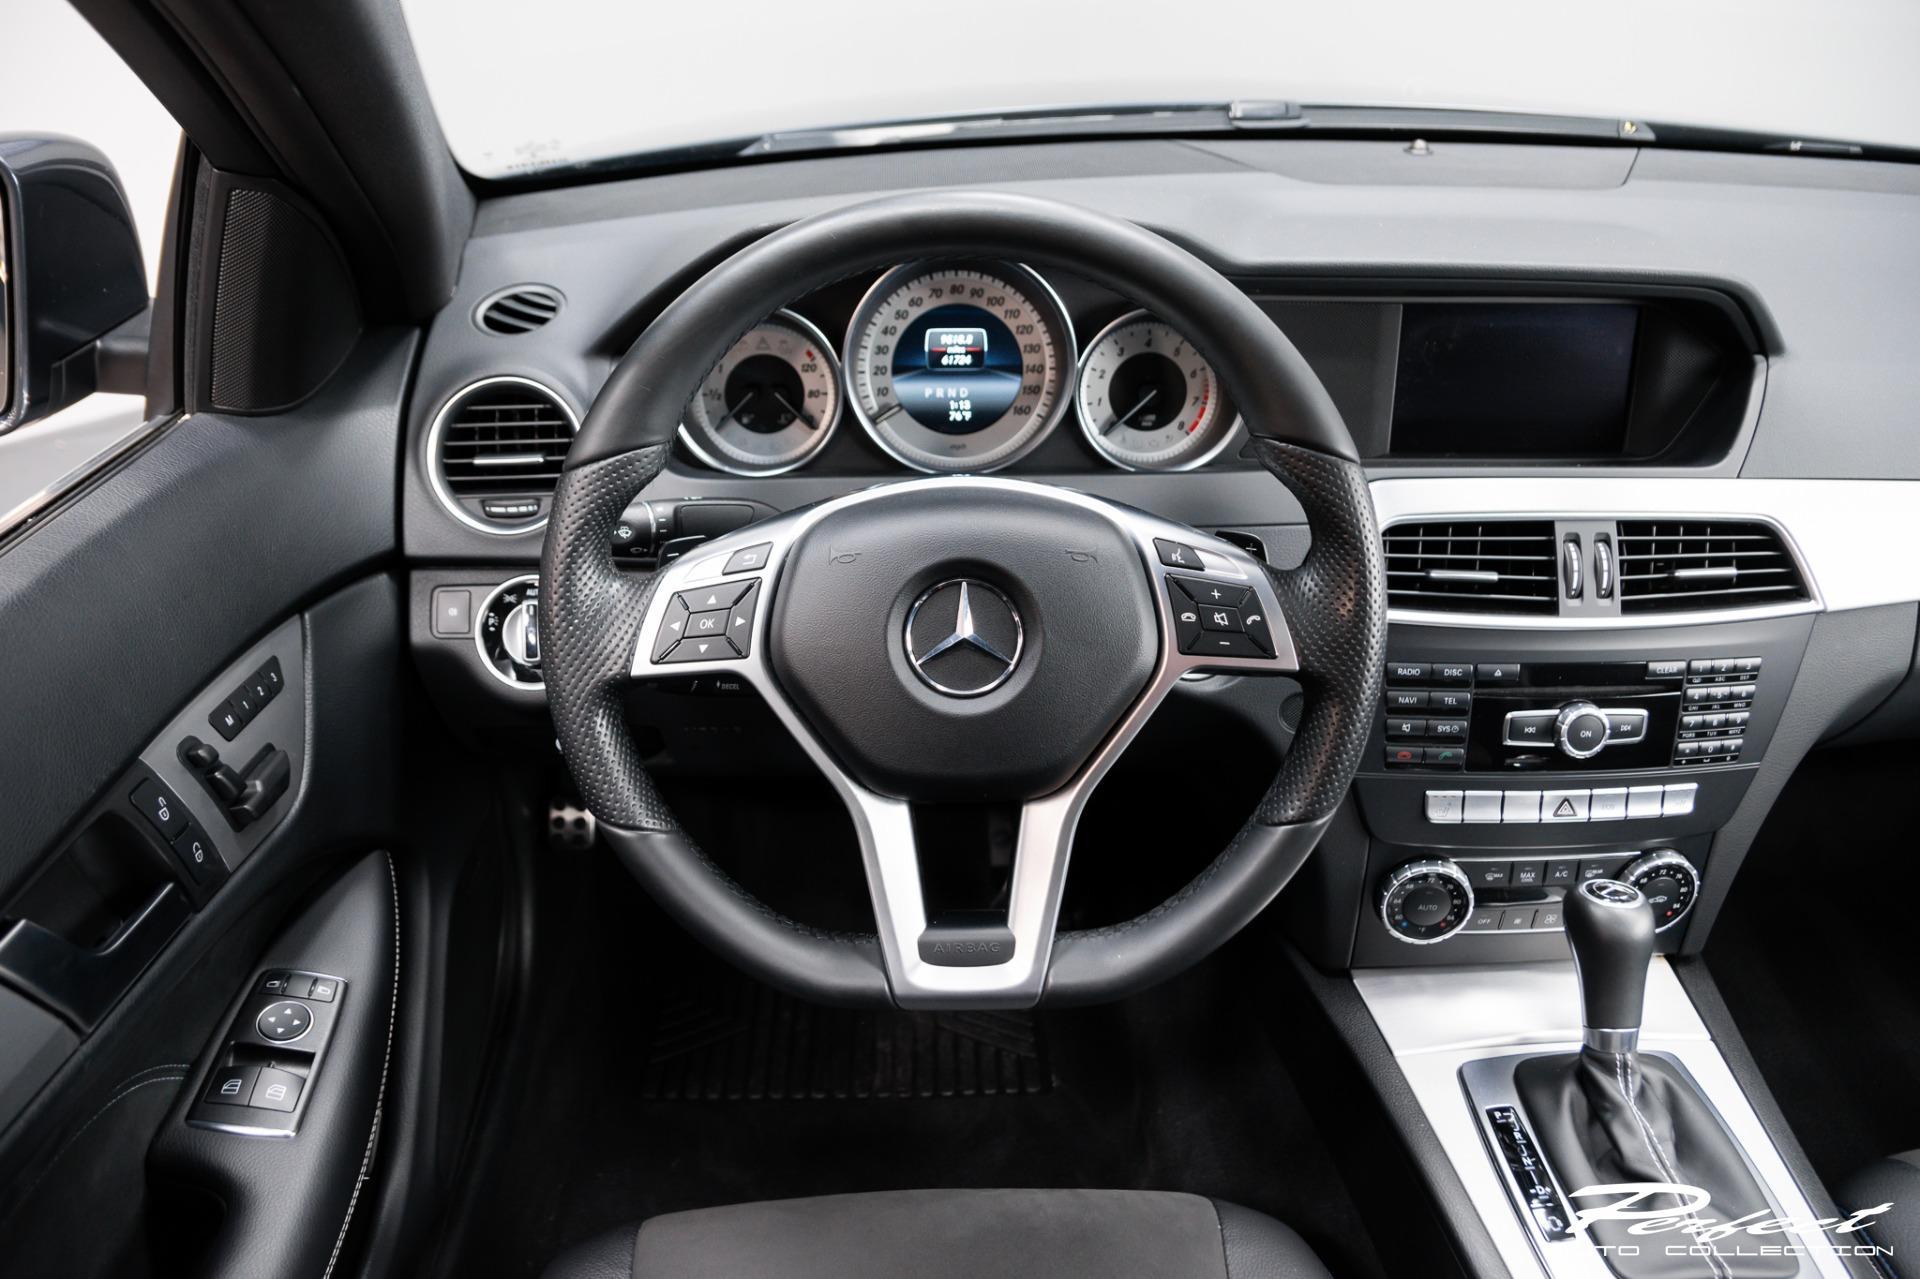 Used 2015 Mercedes Benz C Class C 350 4MATIC